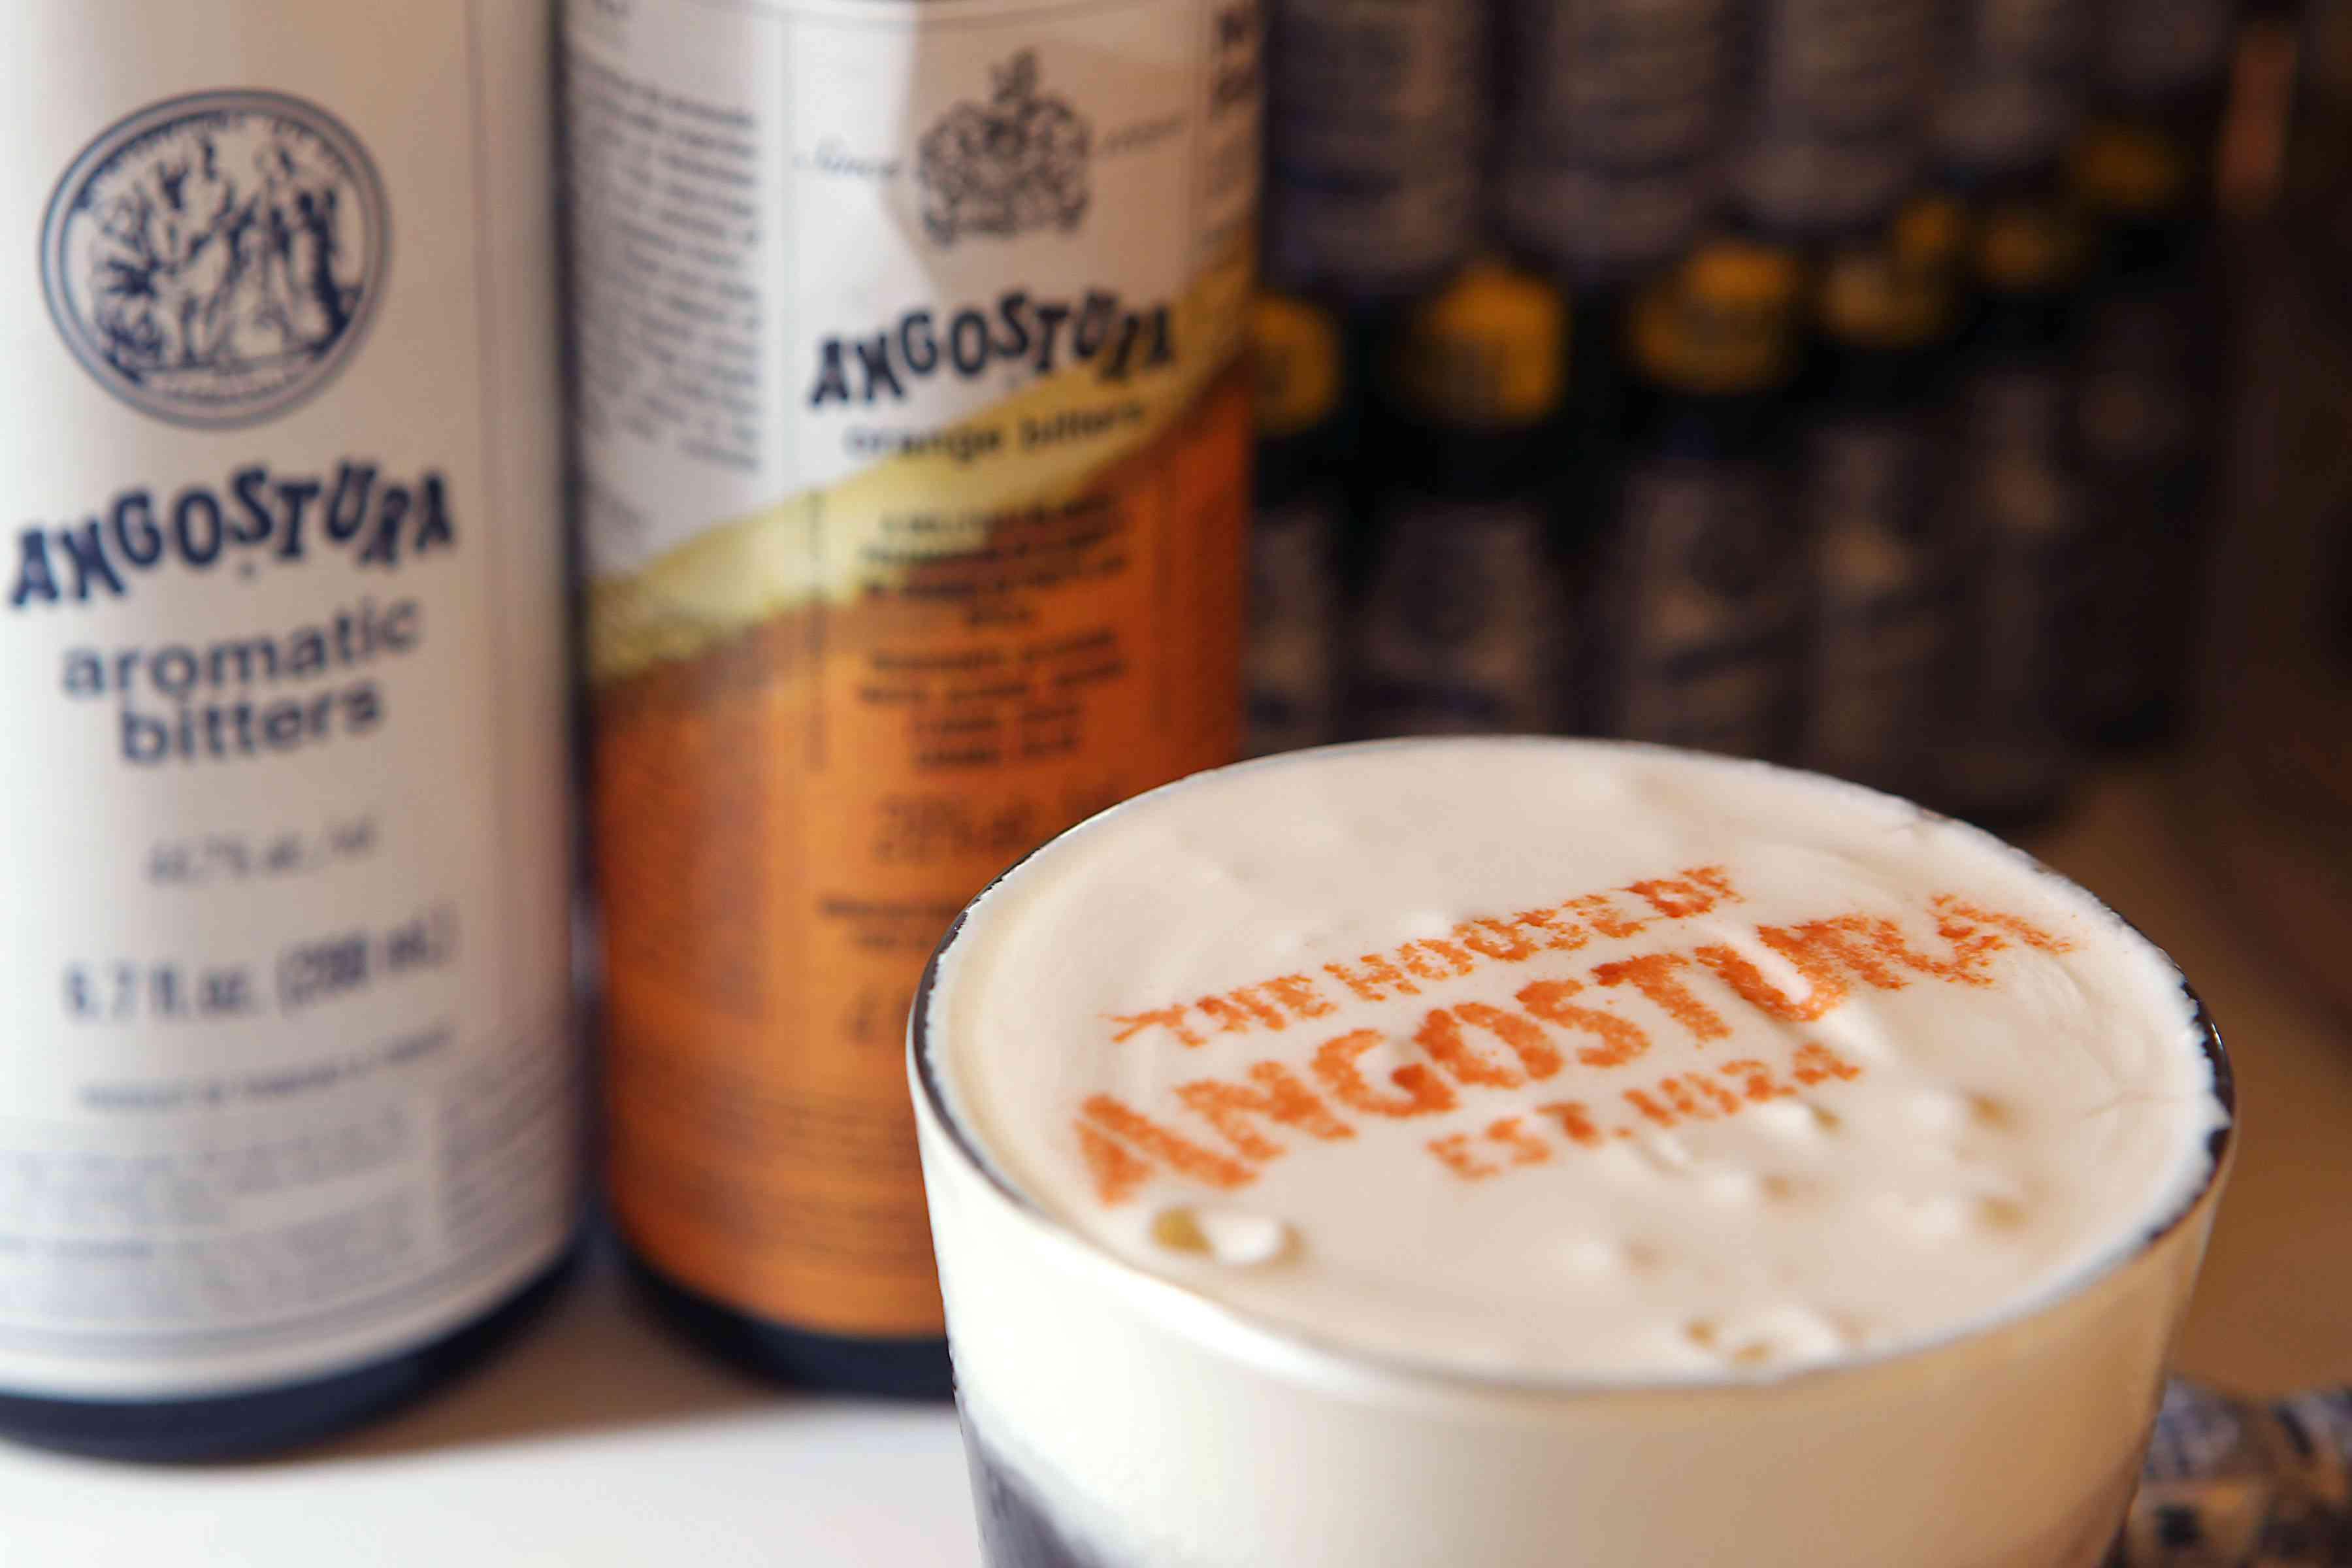 Angostura Aromatic Bitters and Orange Bitters